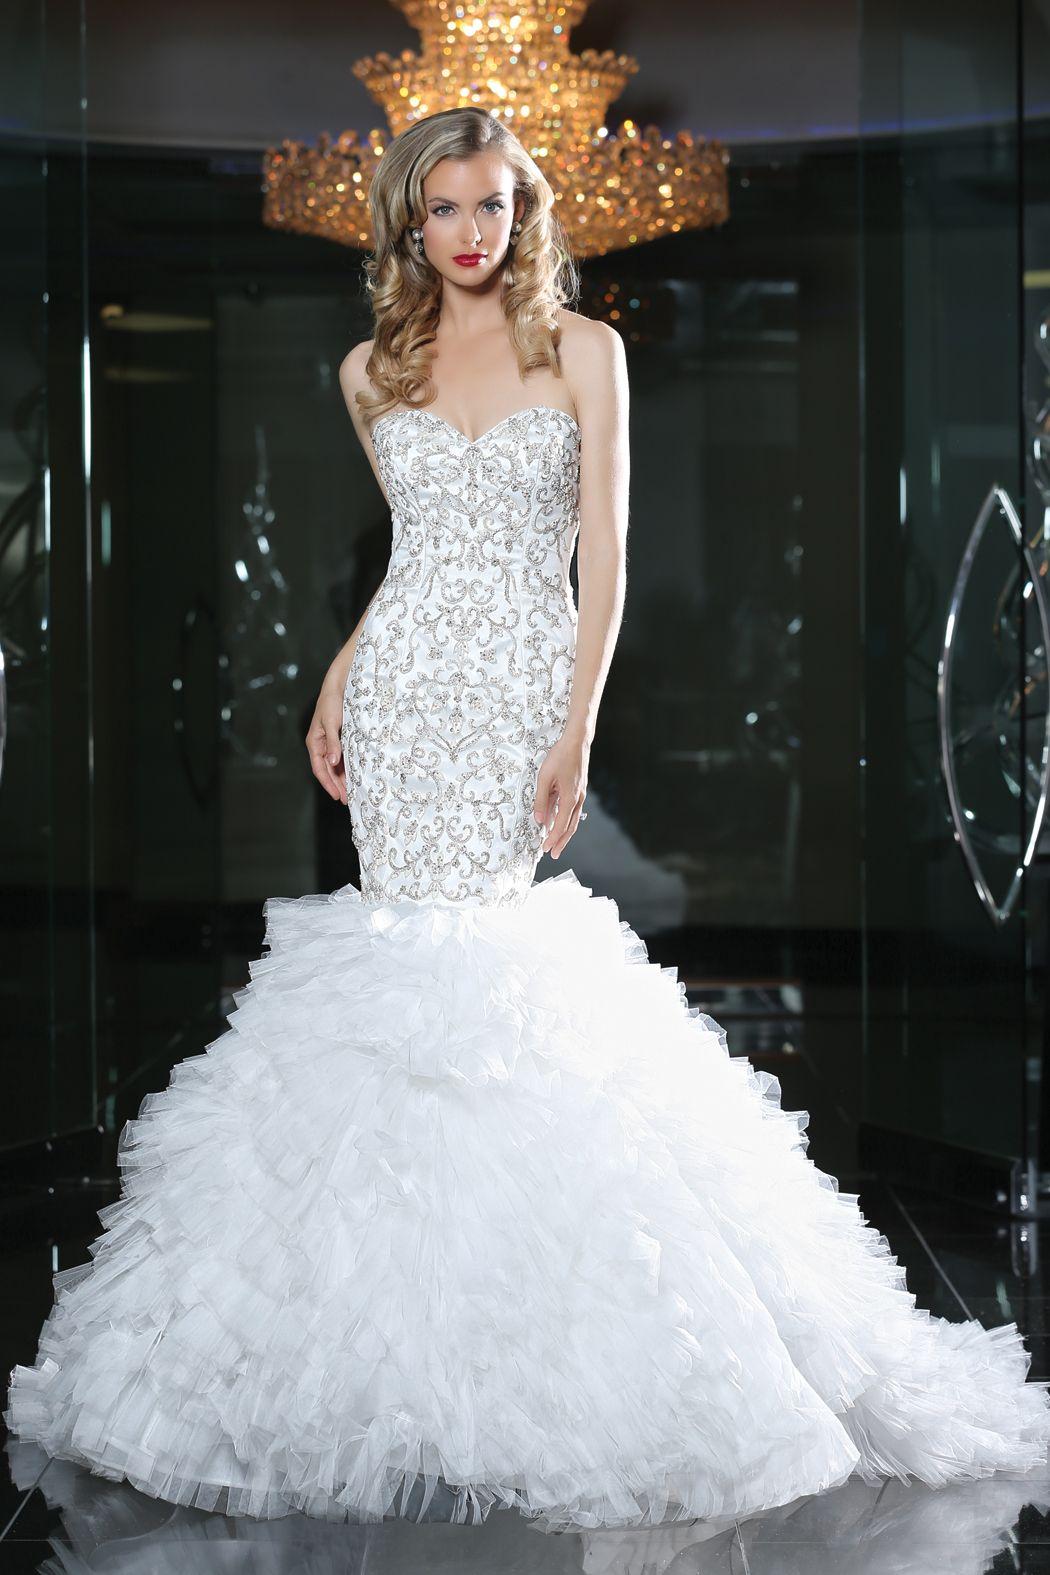 Simone Carvalli wedding gown style 90217 #mermaidsilhouette #strapless #sweetheart #bling #ruffles